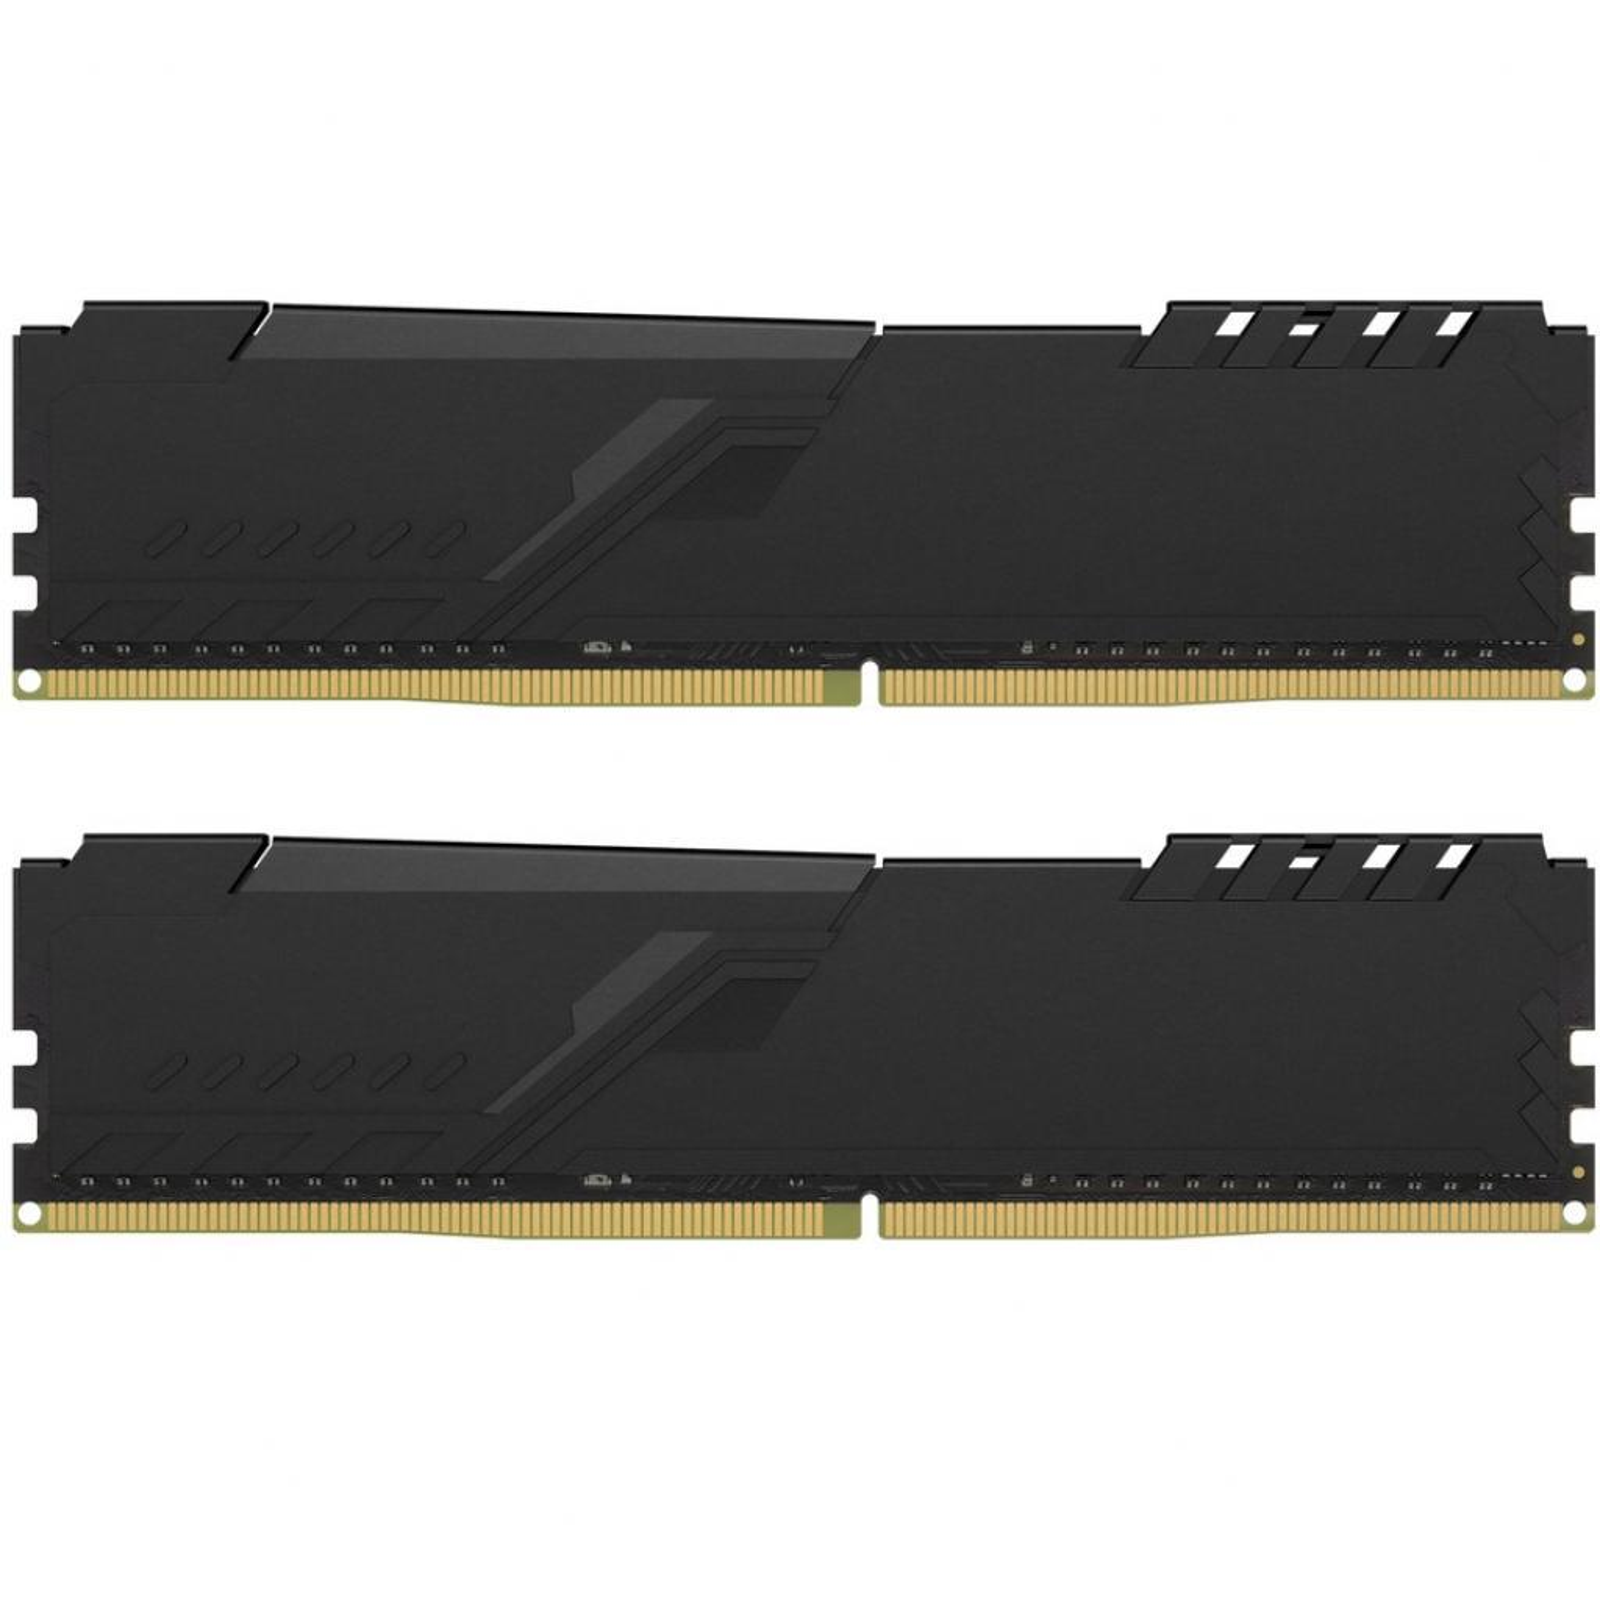 Модуль памяти для компьютера DDR4 8GB (2x4GB) 3200 MHz HyperX Fury Black HyperX (Kingston Fury) (HX432C16FB3K2/8) изображение 2